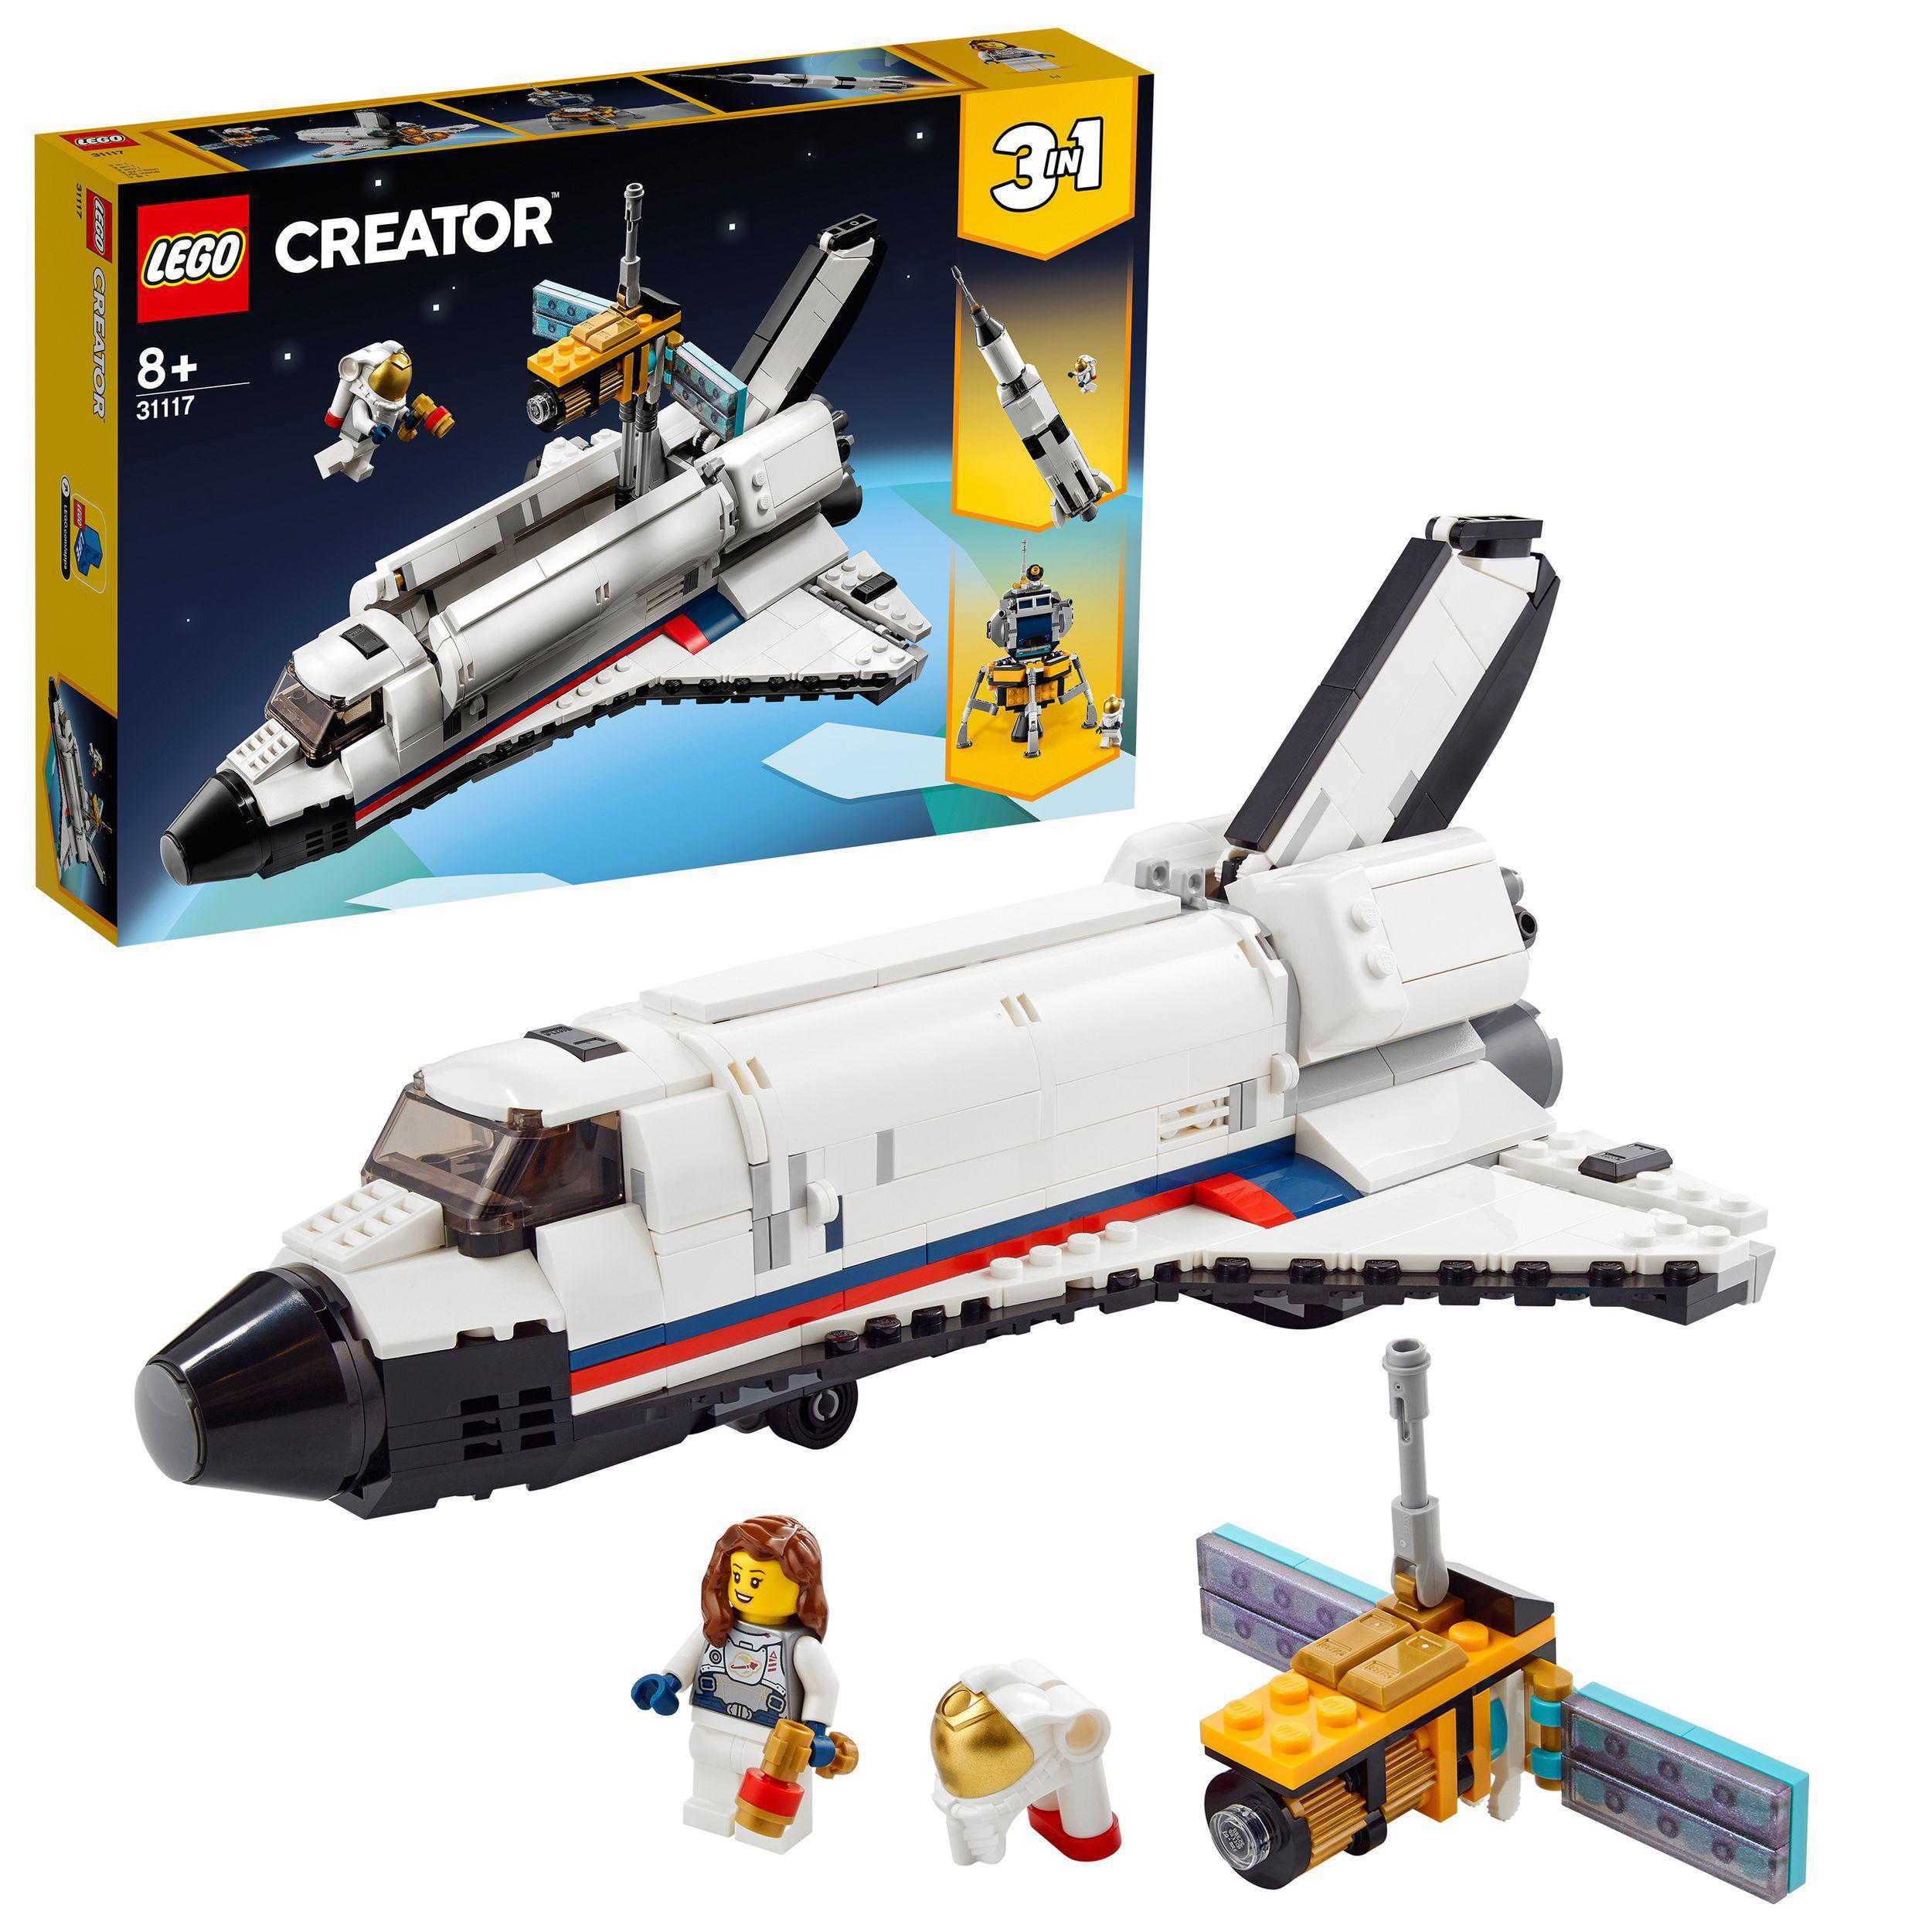 LEGO Creator - Space Shuttle Adventure (31117)